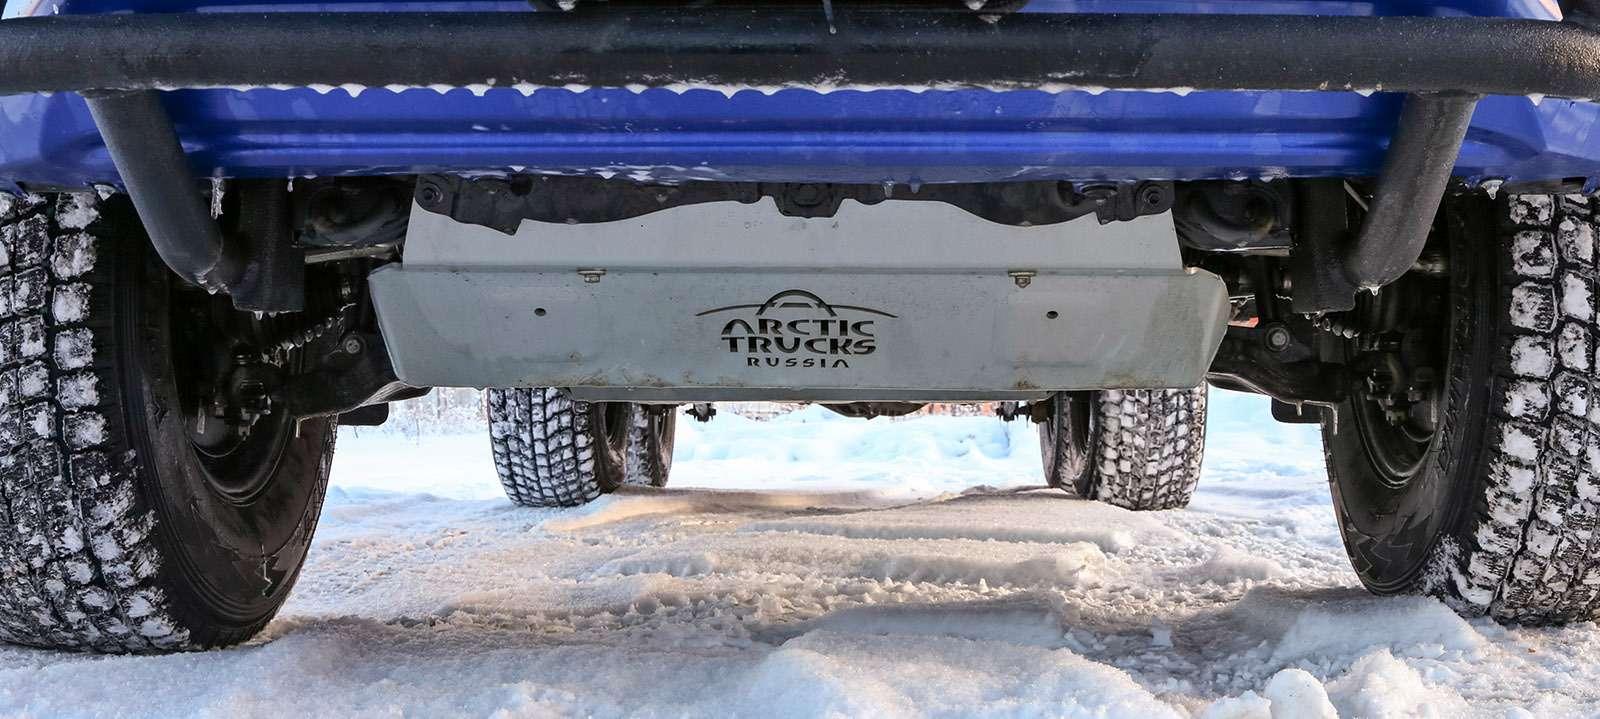 Пикапы Toyota Hilux Arctic Trucks: 4х4или 6х6?— фото 745685